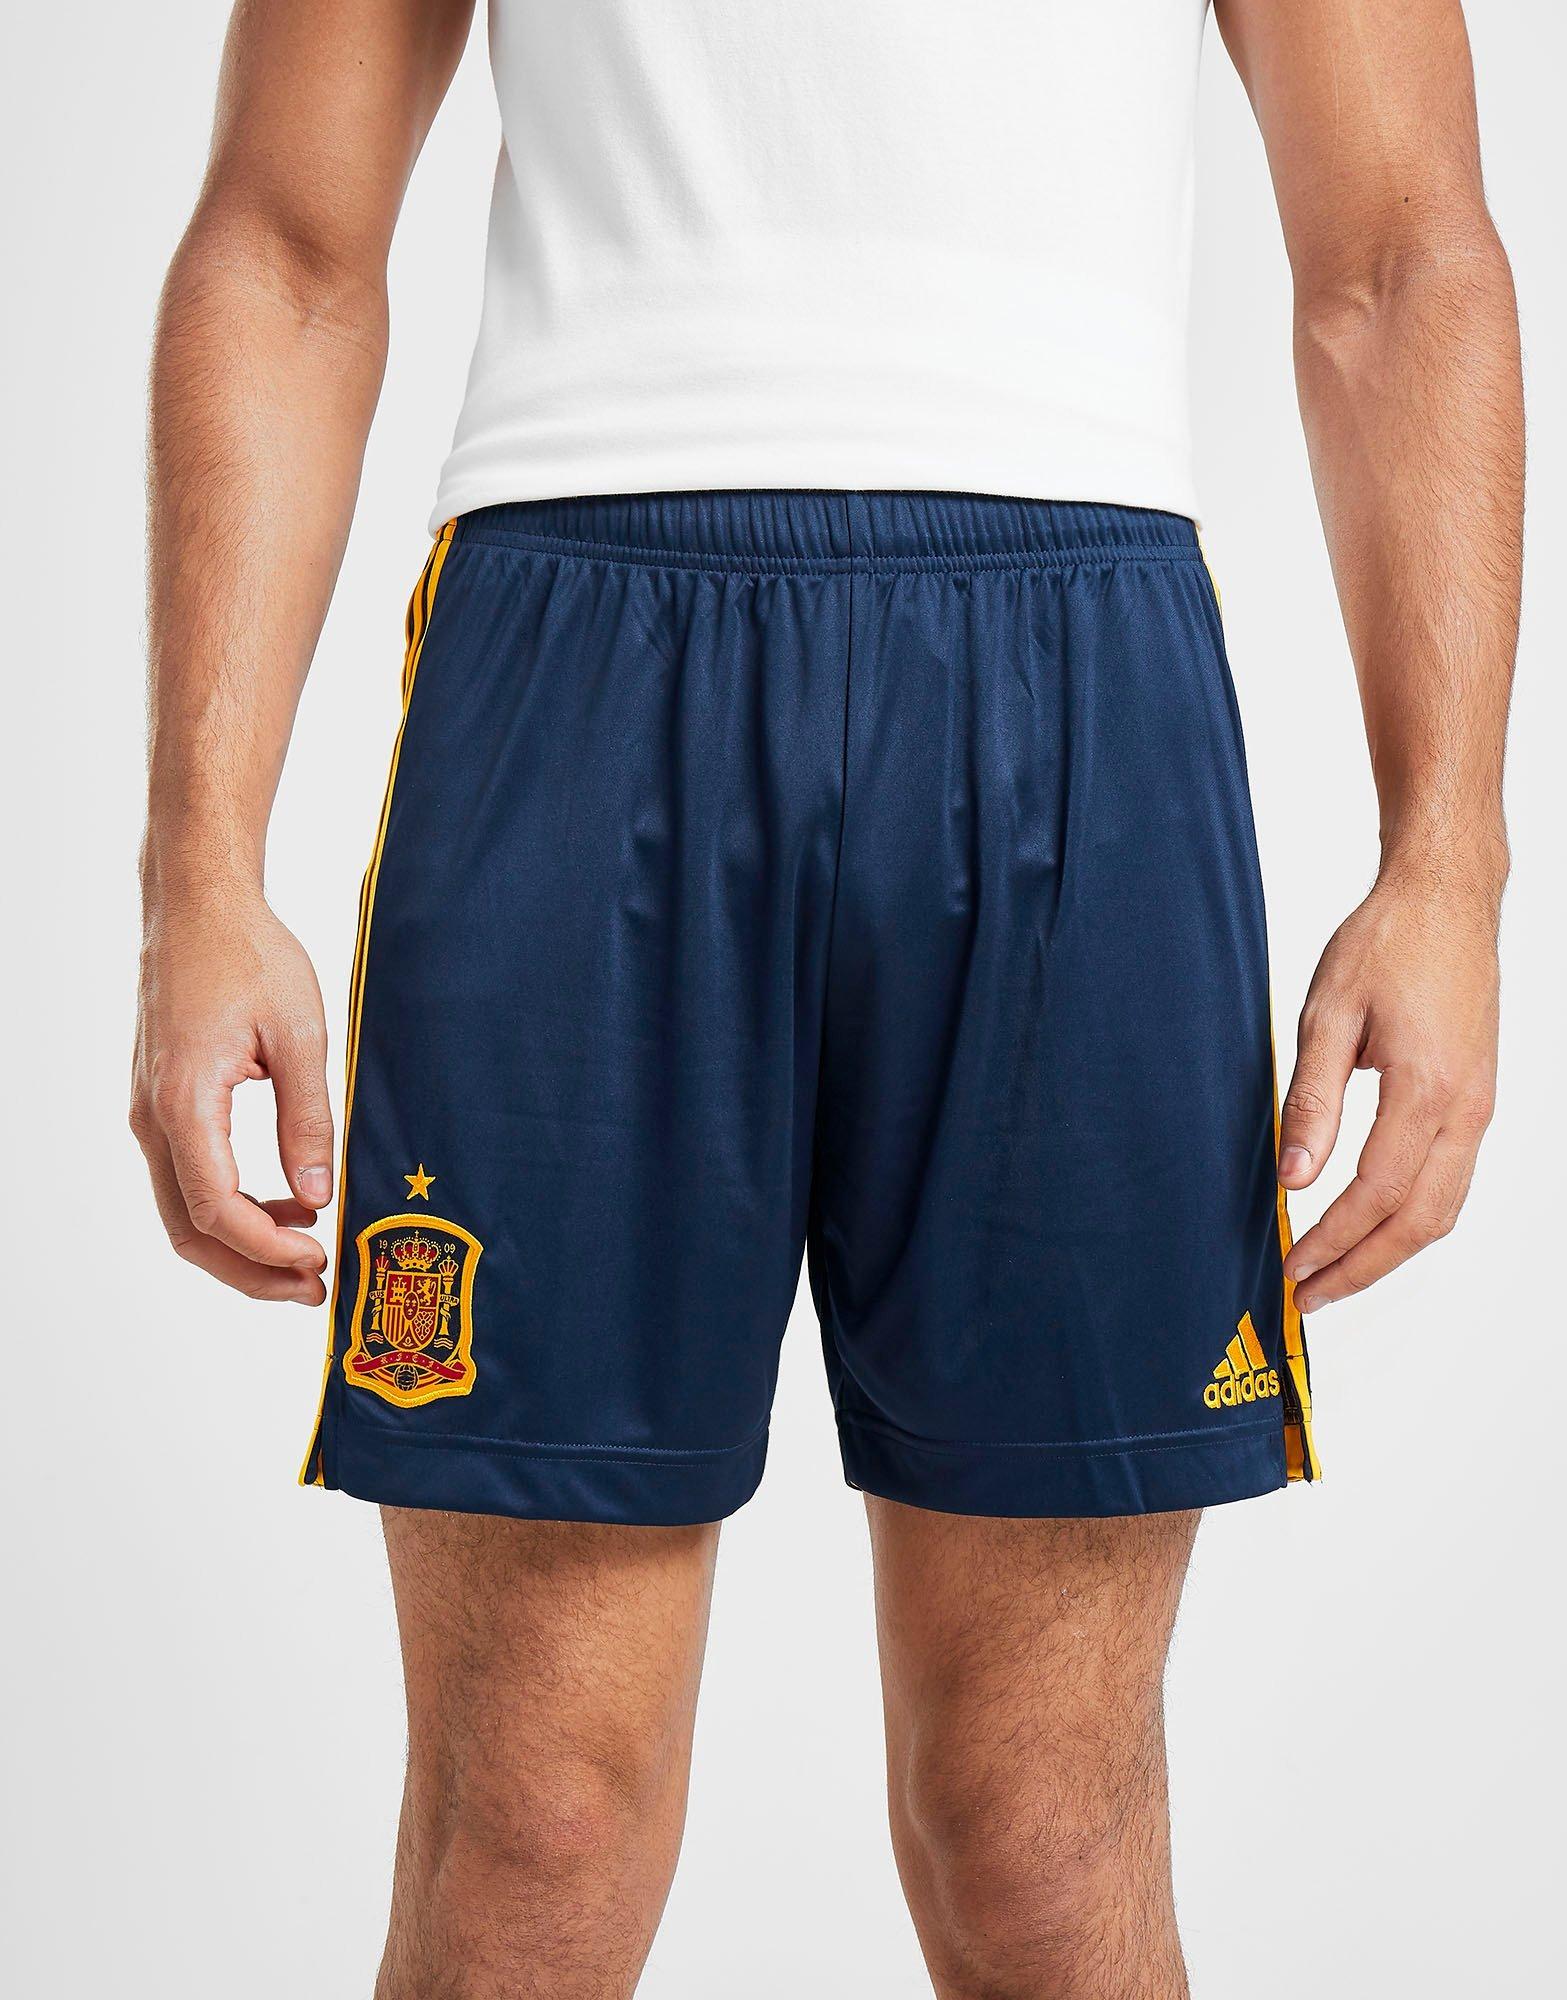 Pantalon Adidas de la Seleccion Española (Tallas S a XL)